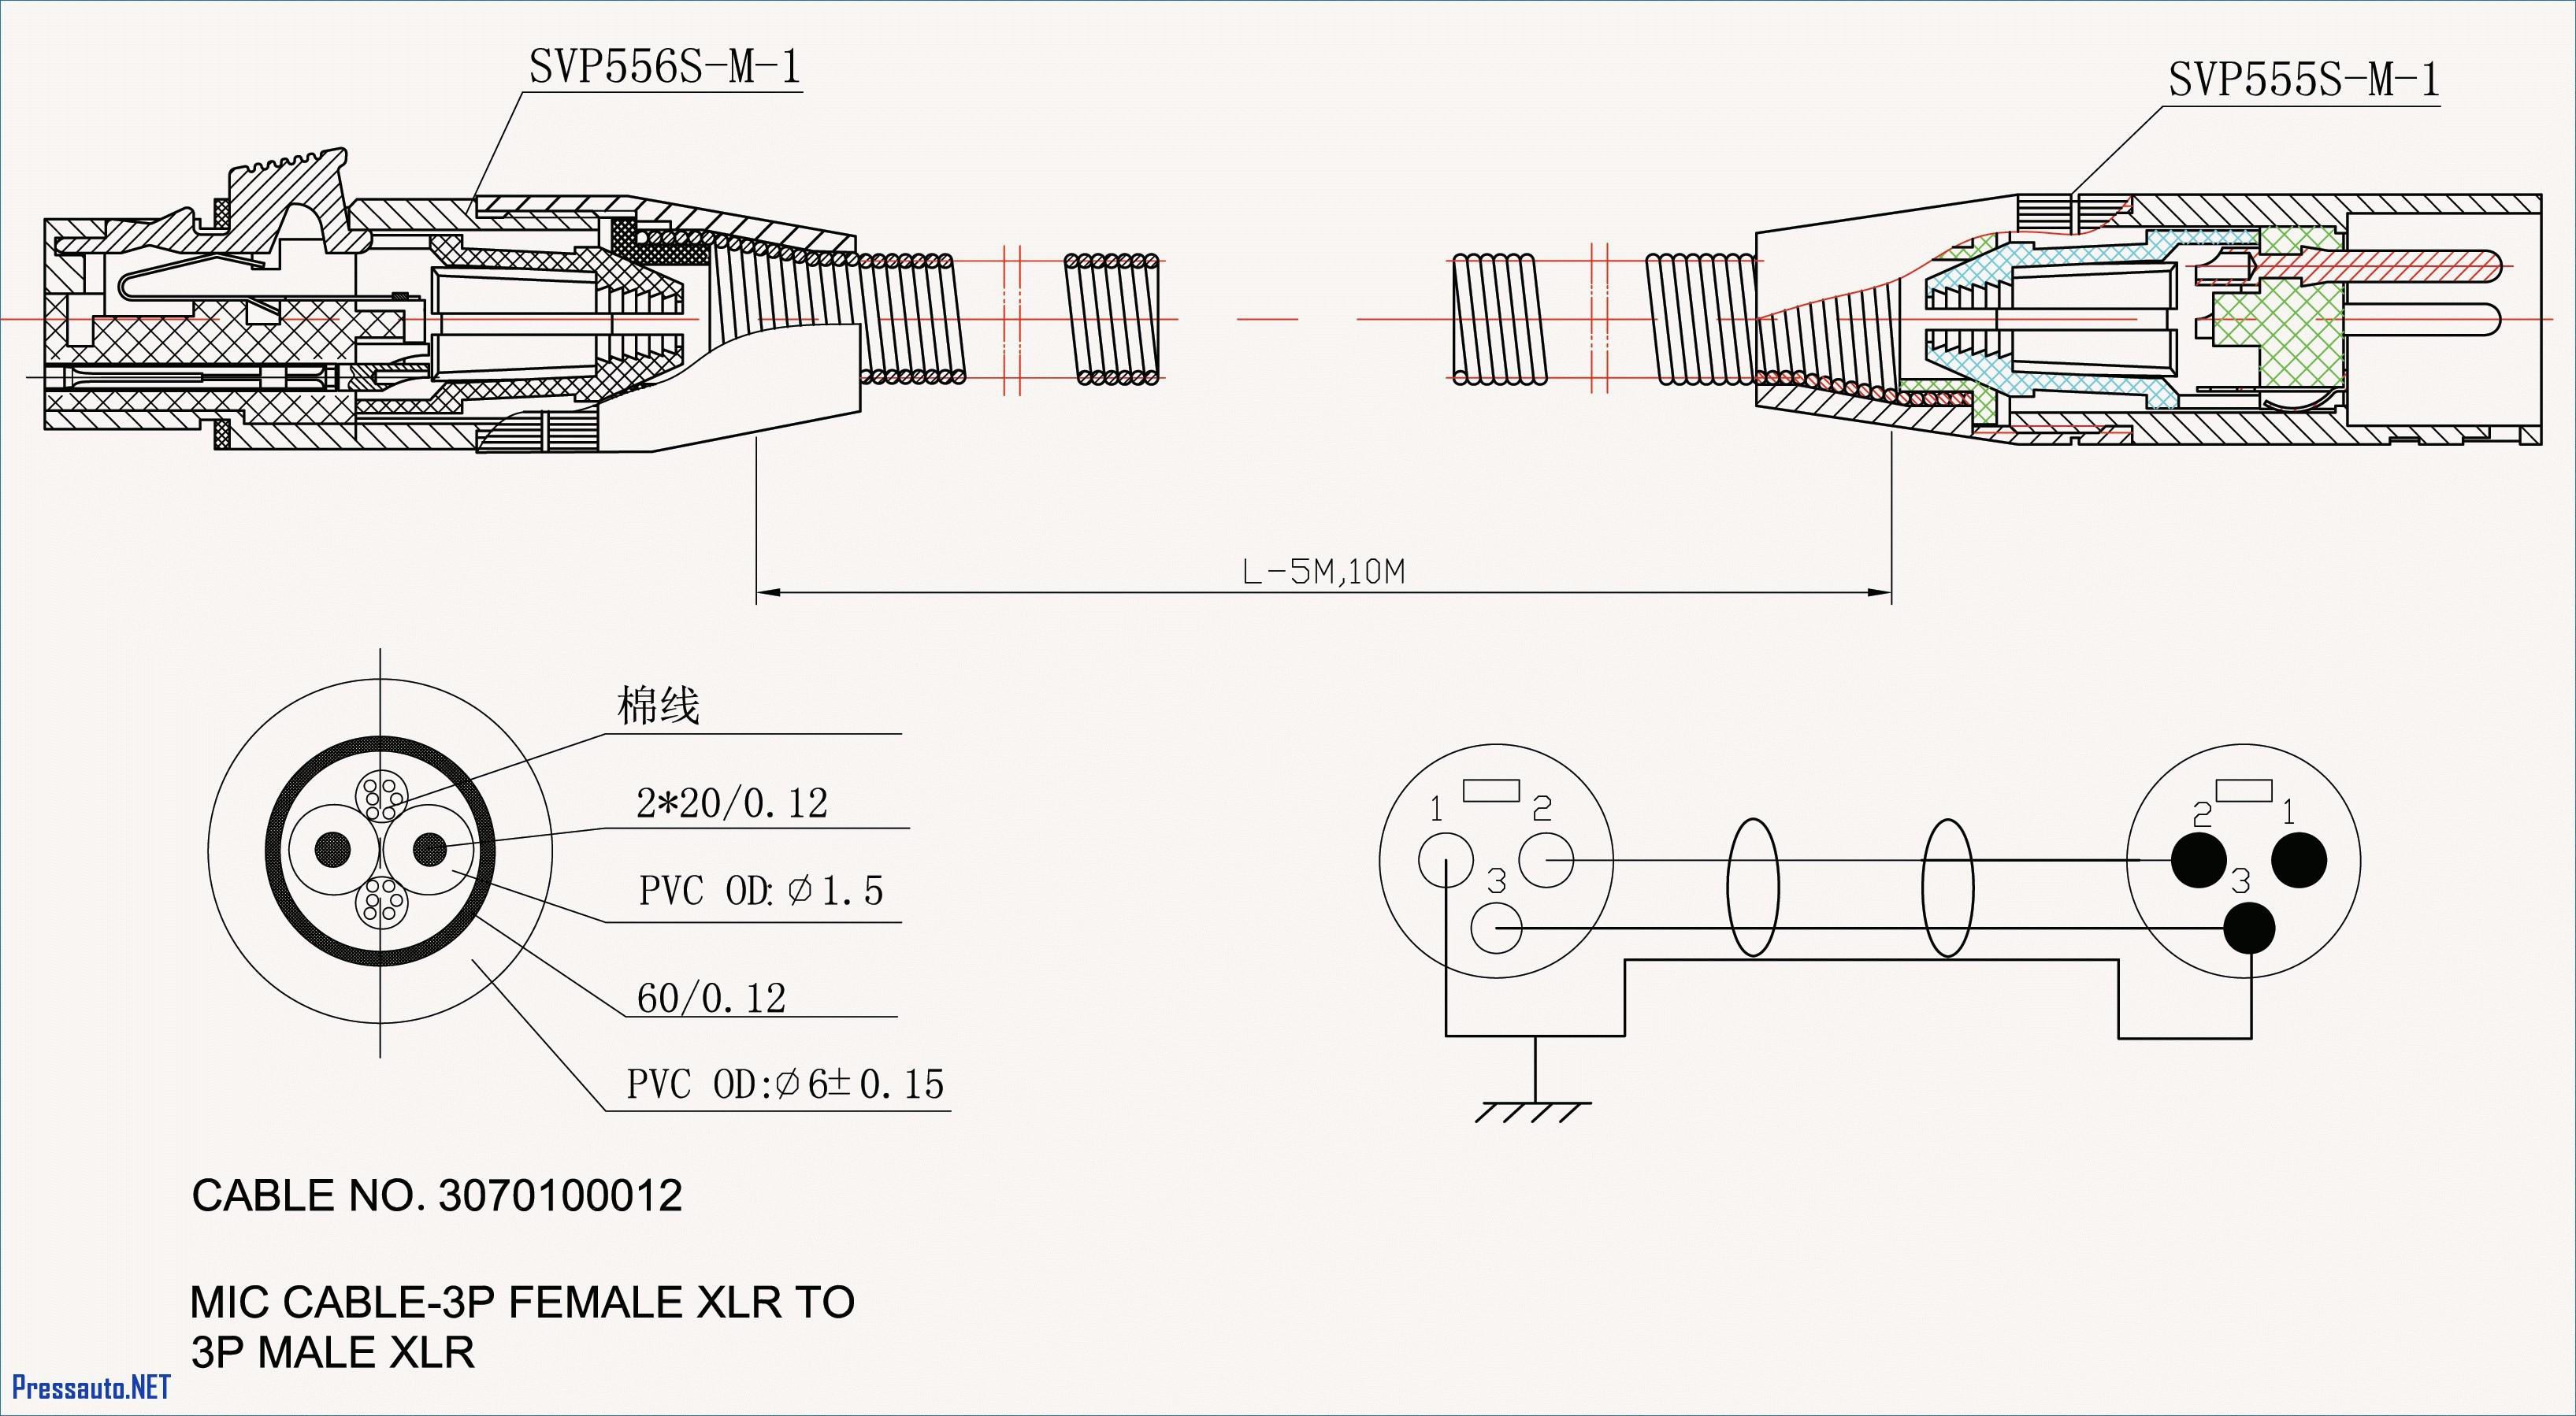 Gm Alternator Wiring Diagram Internal Regulator Save Fresh 3 Wire Alternator Wiring Diagram Wiring